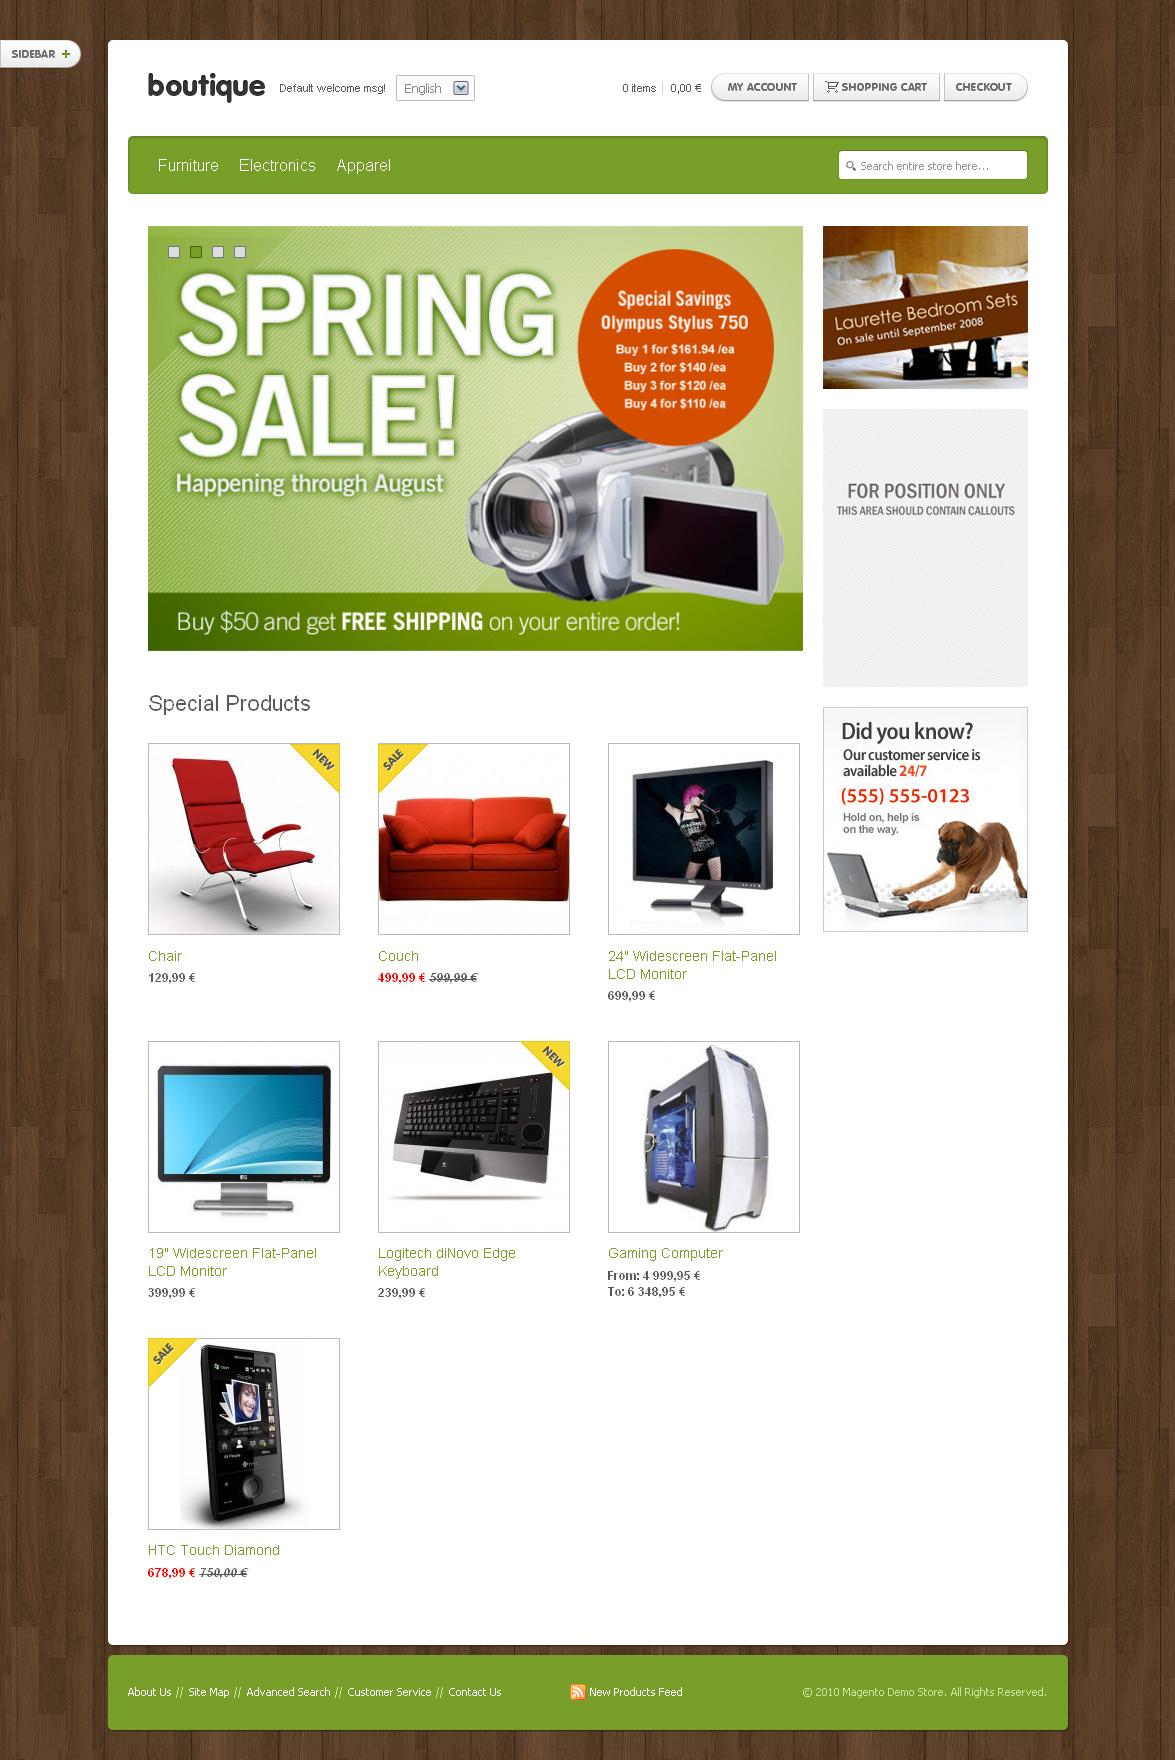 http://3.s3.envato.com/files/1203830/boutiqueScreenshots/02_Homepage.jpg